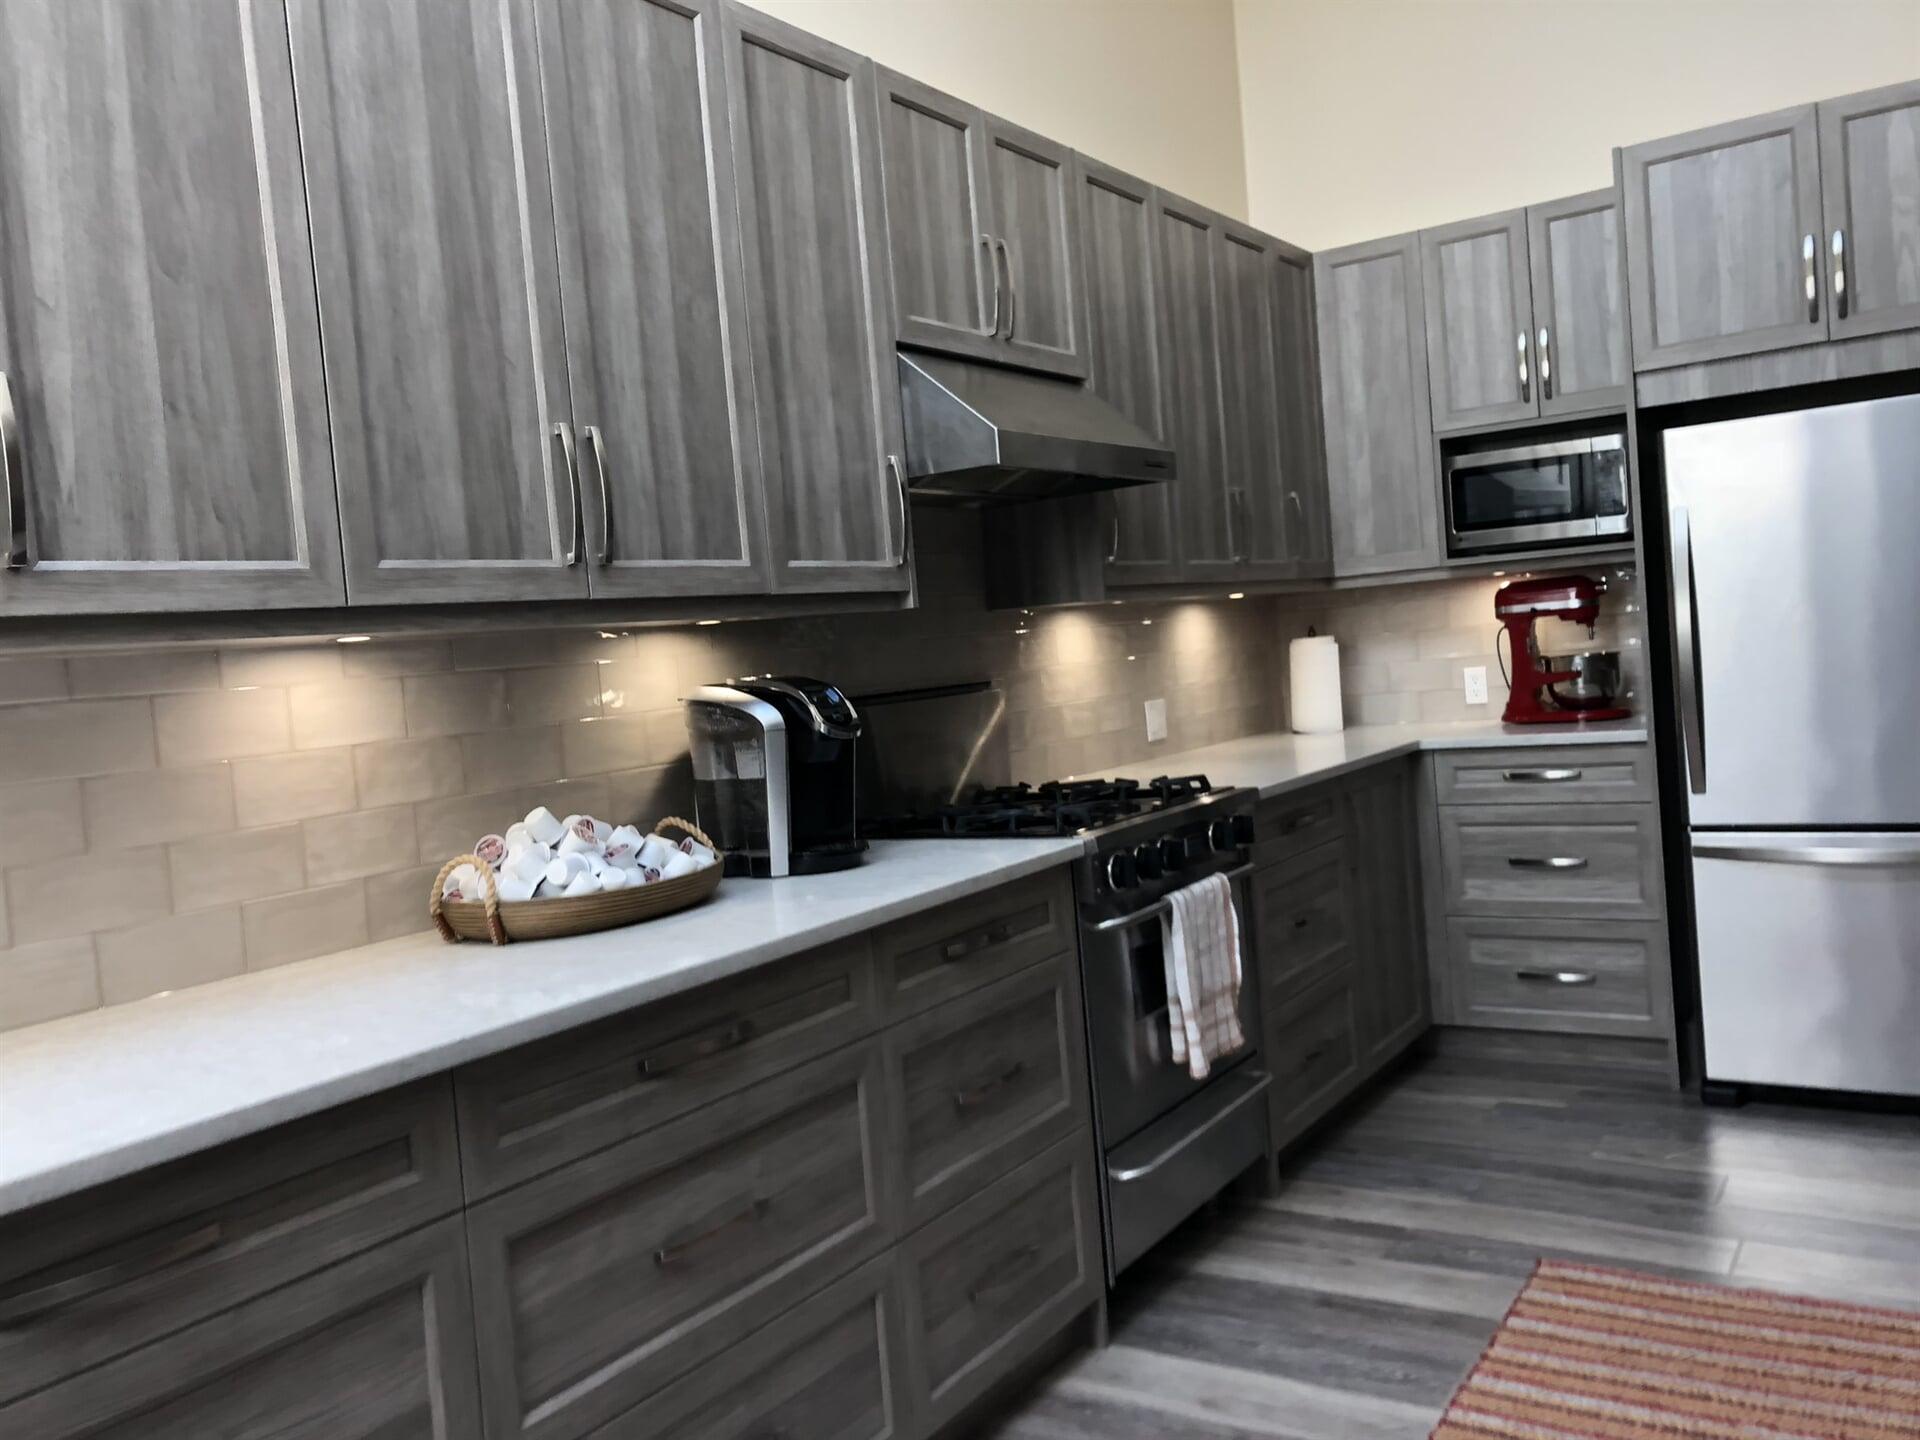 twin-oaks-woodworking-ltd-parksville-kitchen-cabinets-02